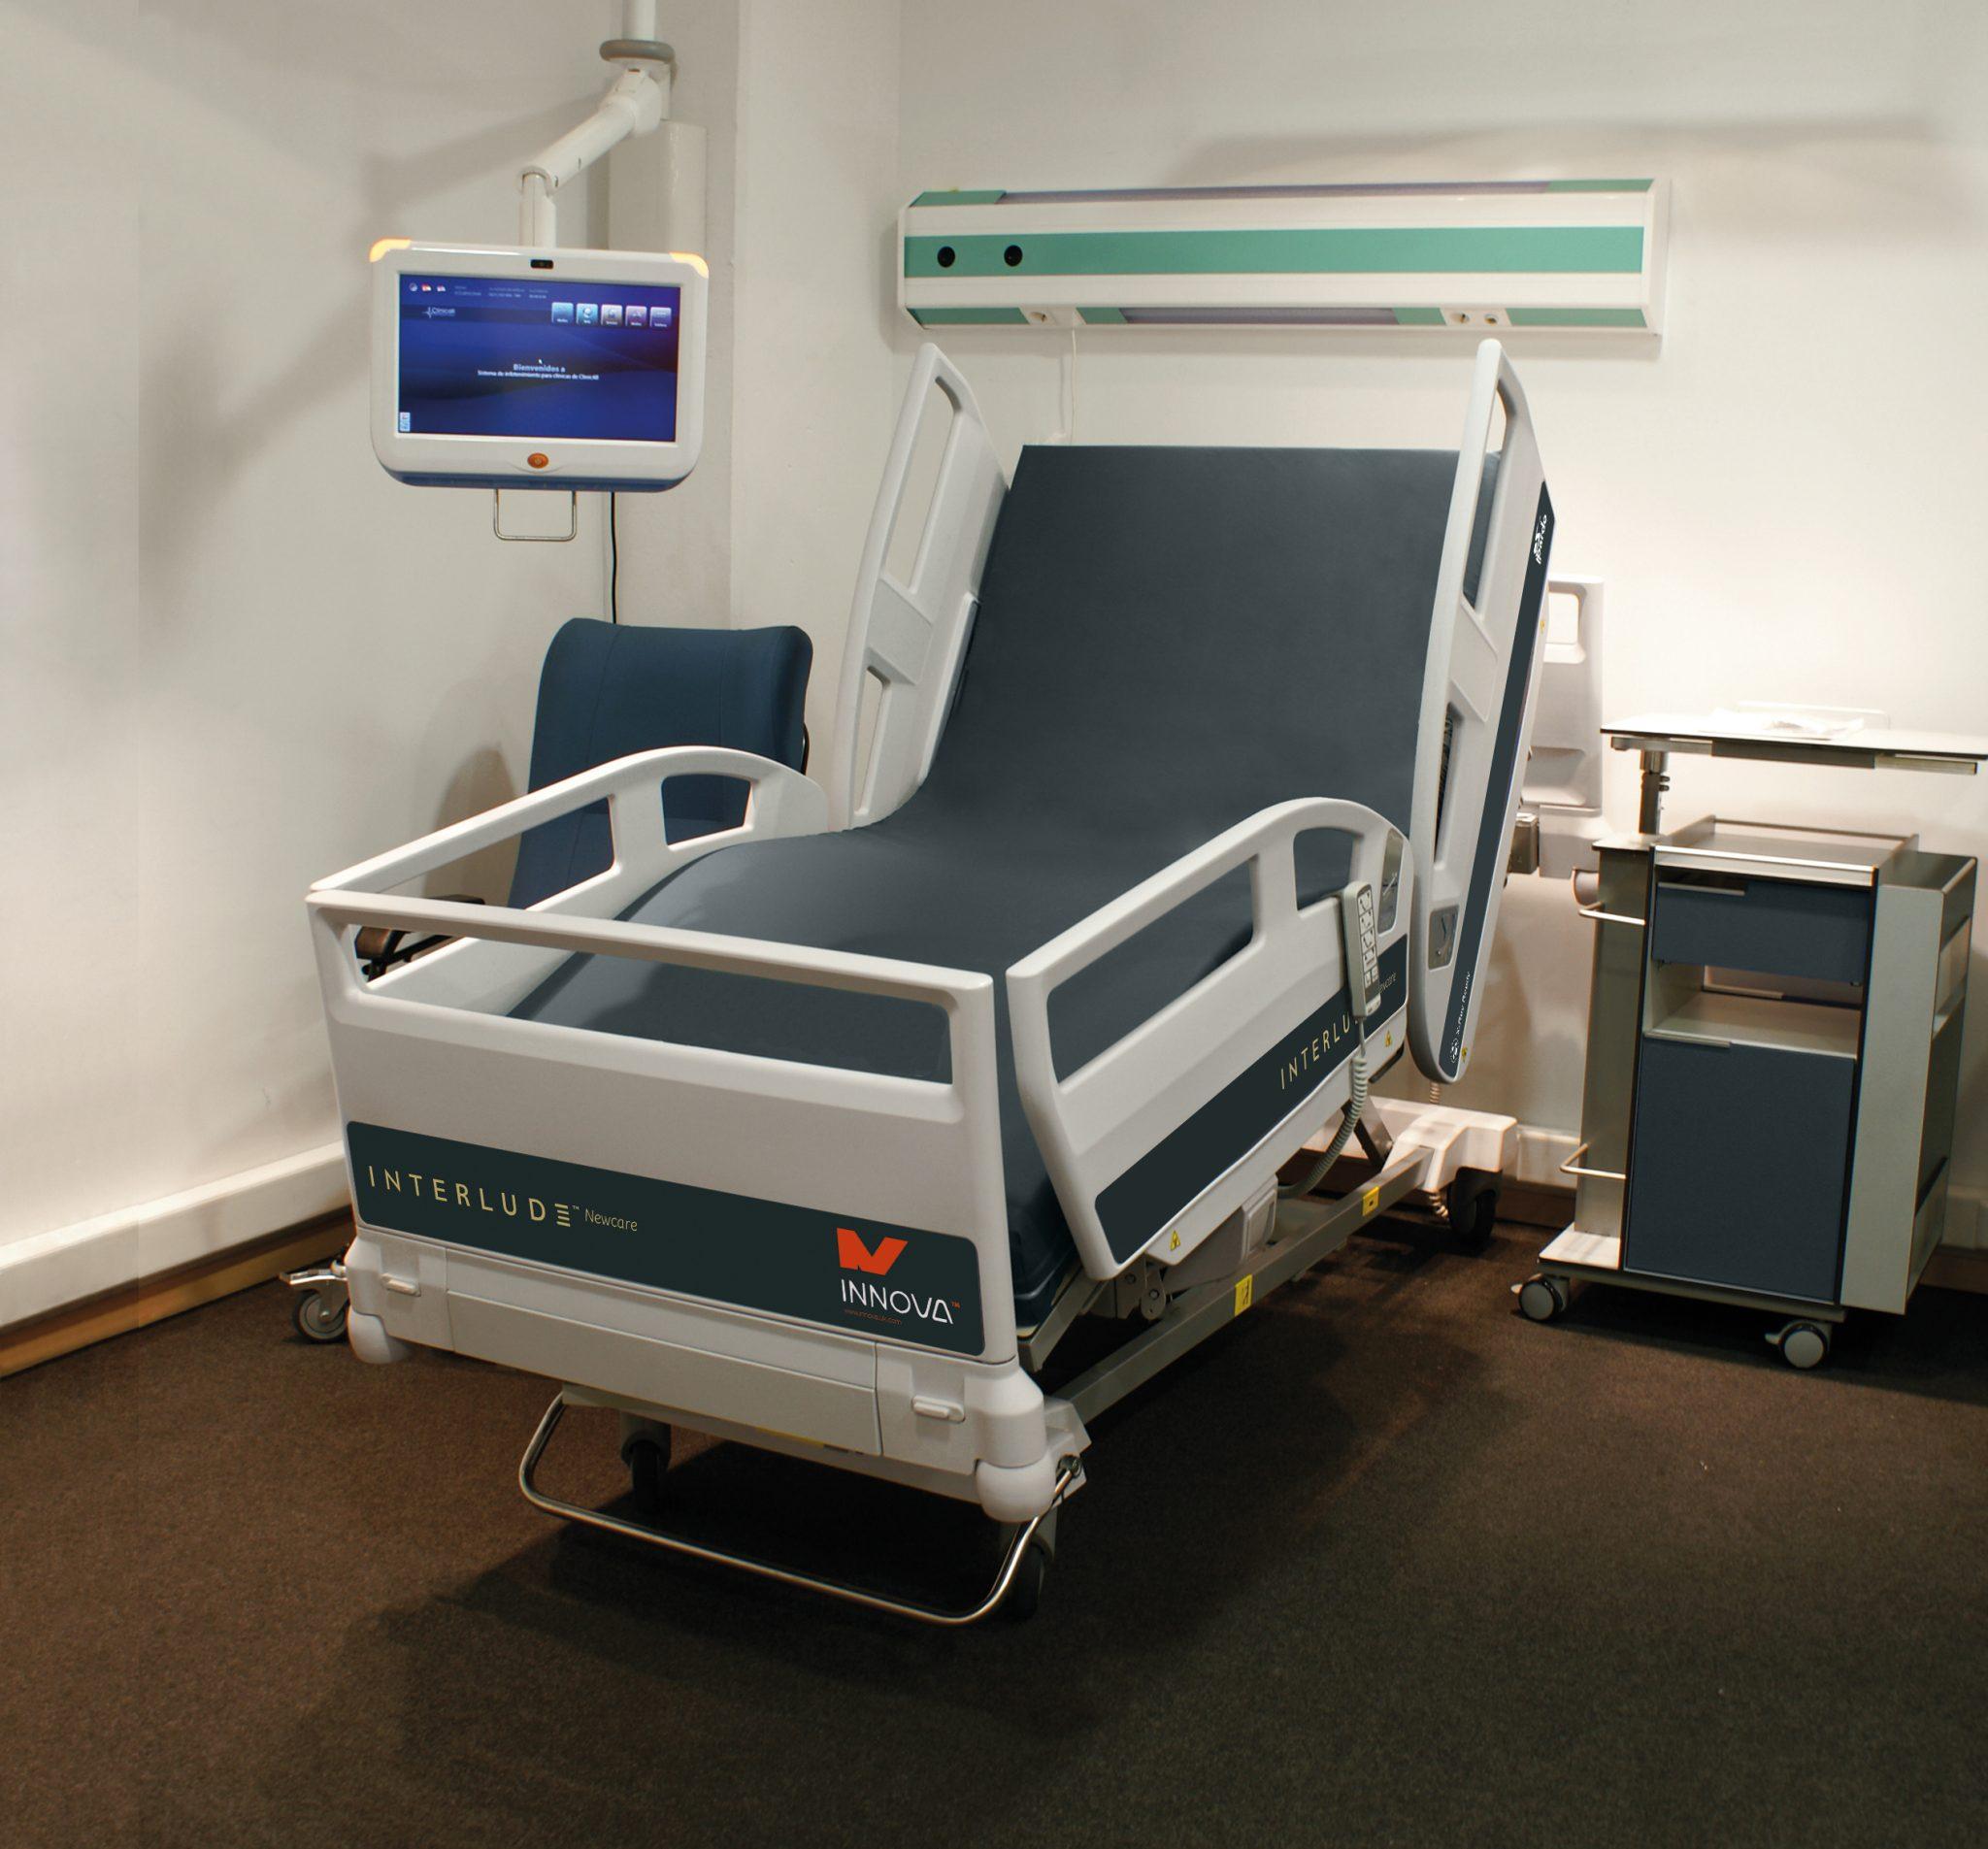 Interlude Hospital Beds Innova Care Concepts